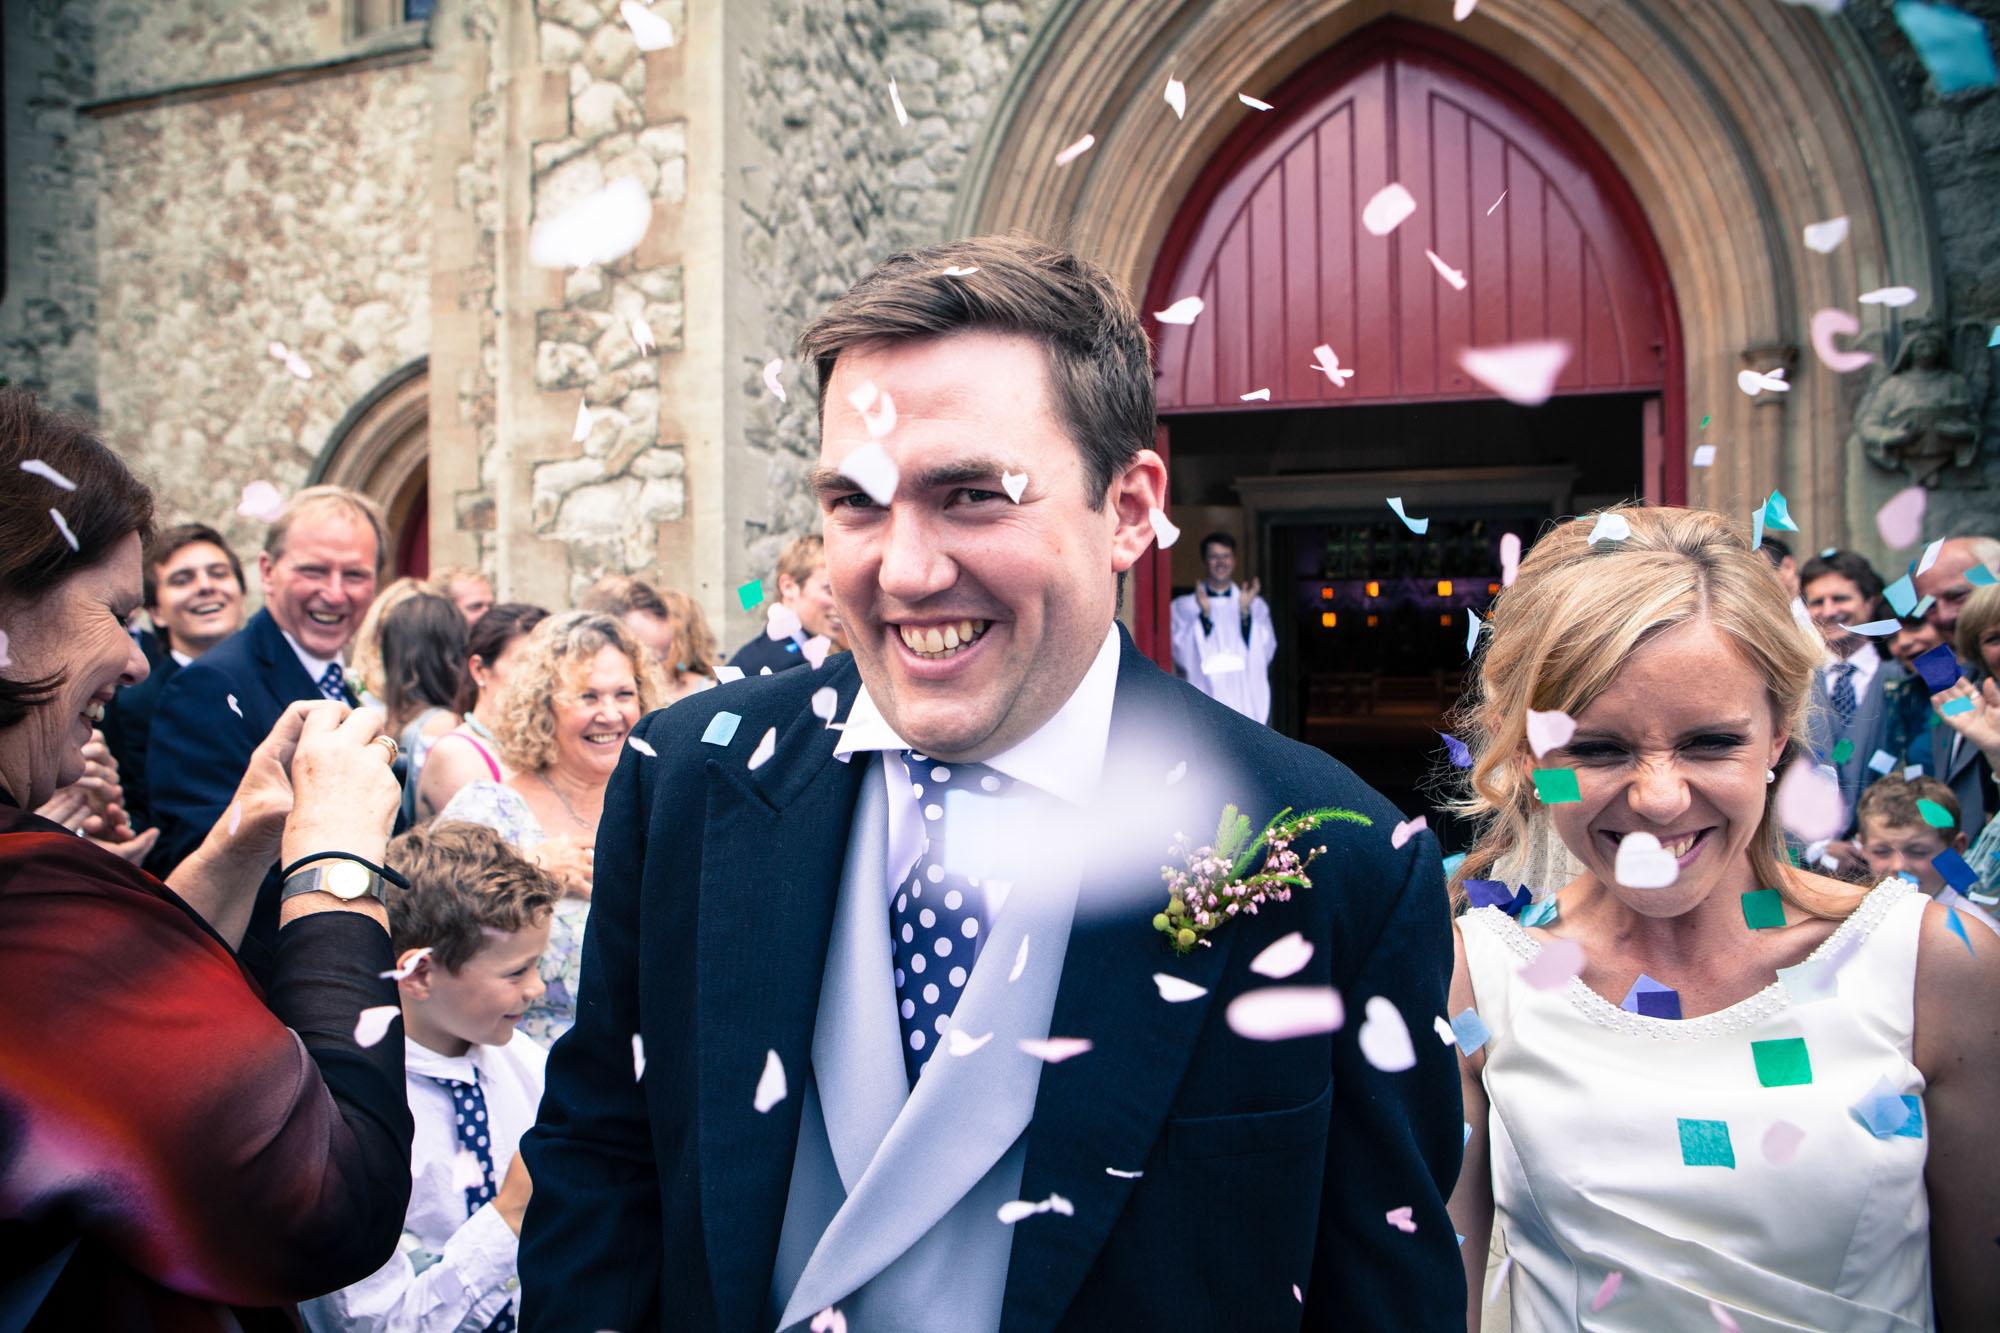 weddings-couples-love-photographer-oxford-london-jonathan-self-photography-46.jpg